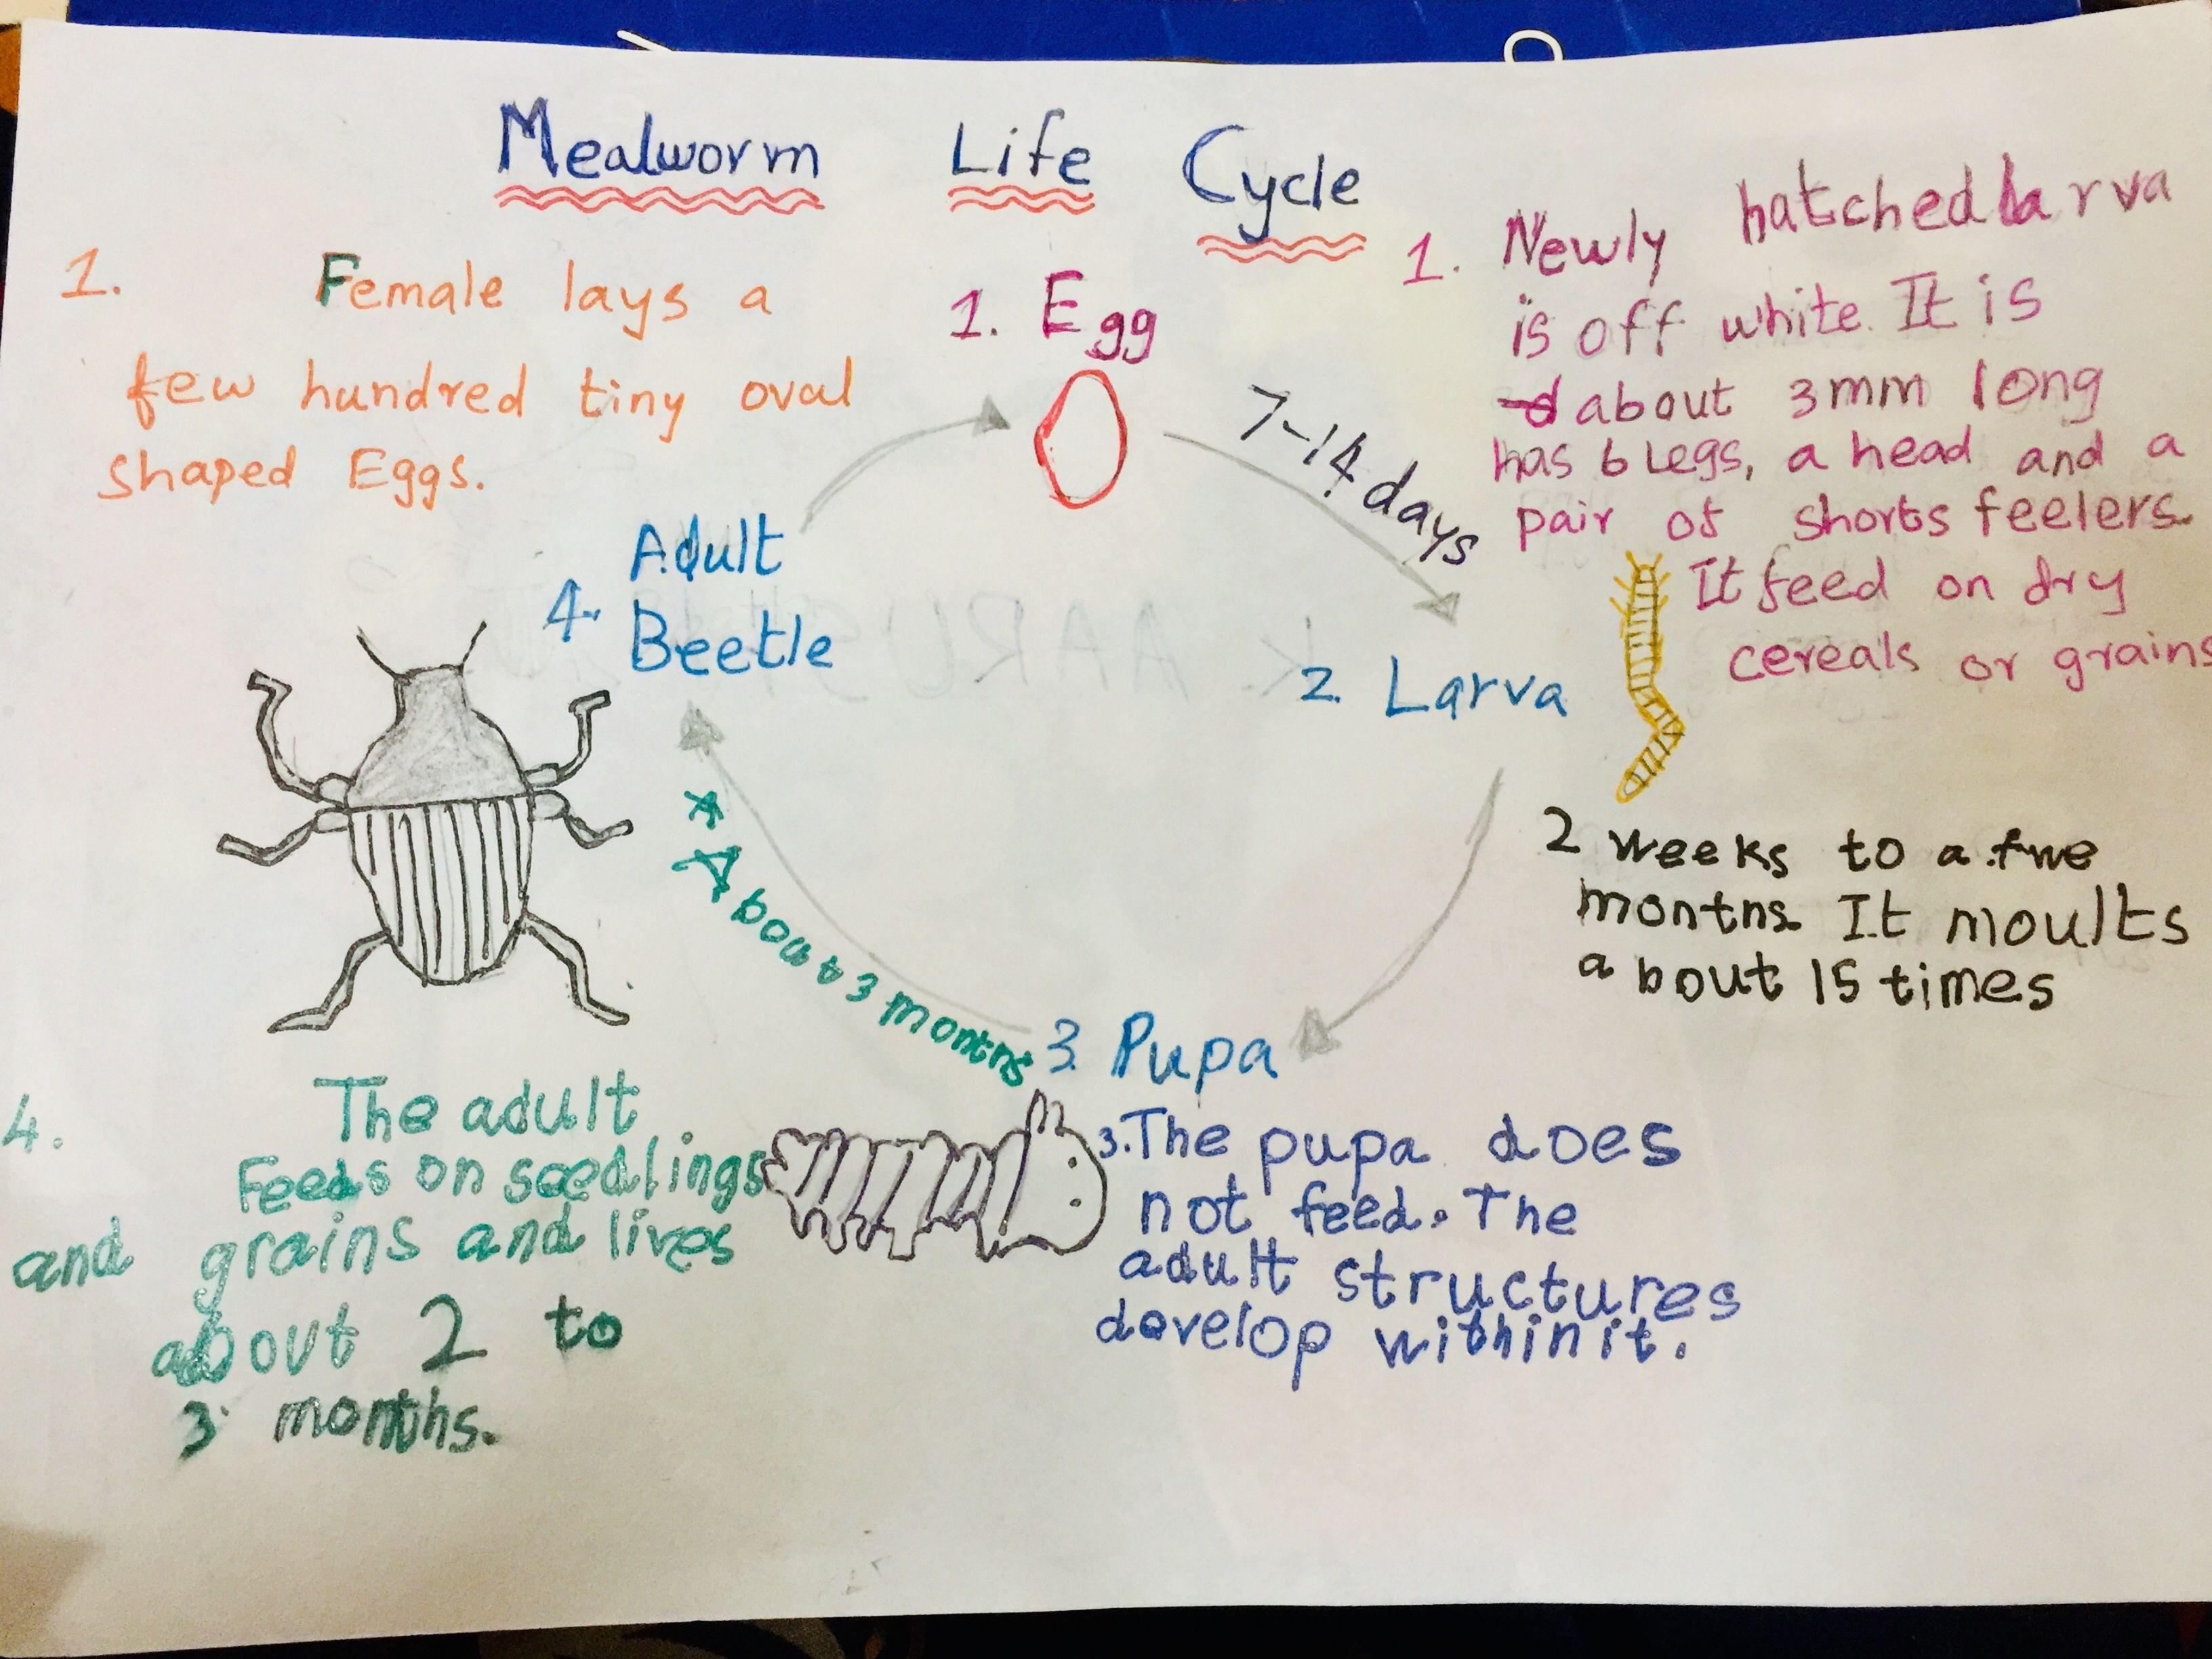 Life Cycle Of Mealworm